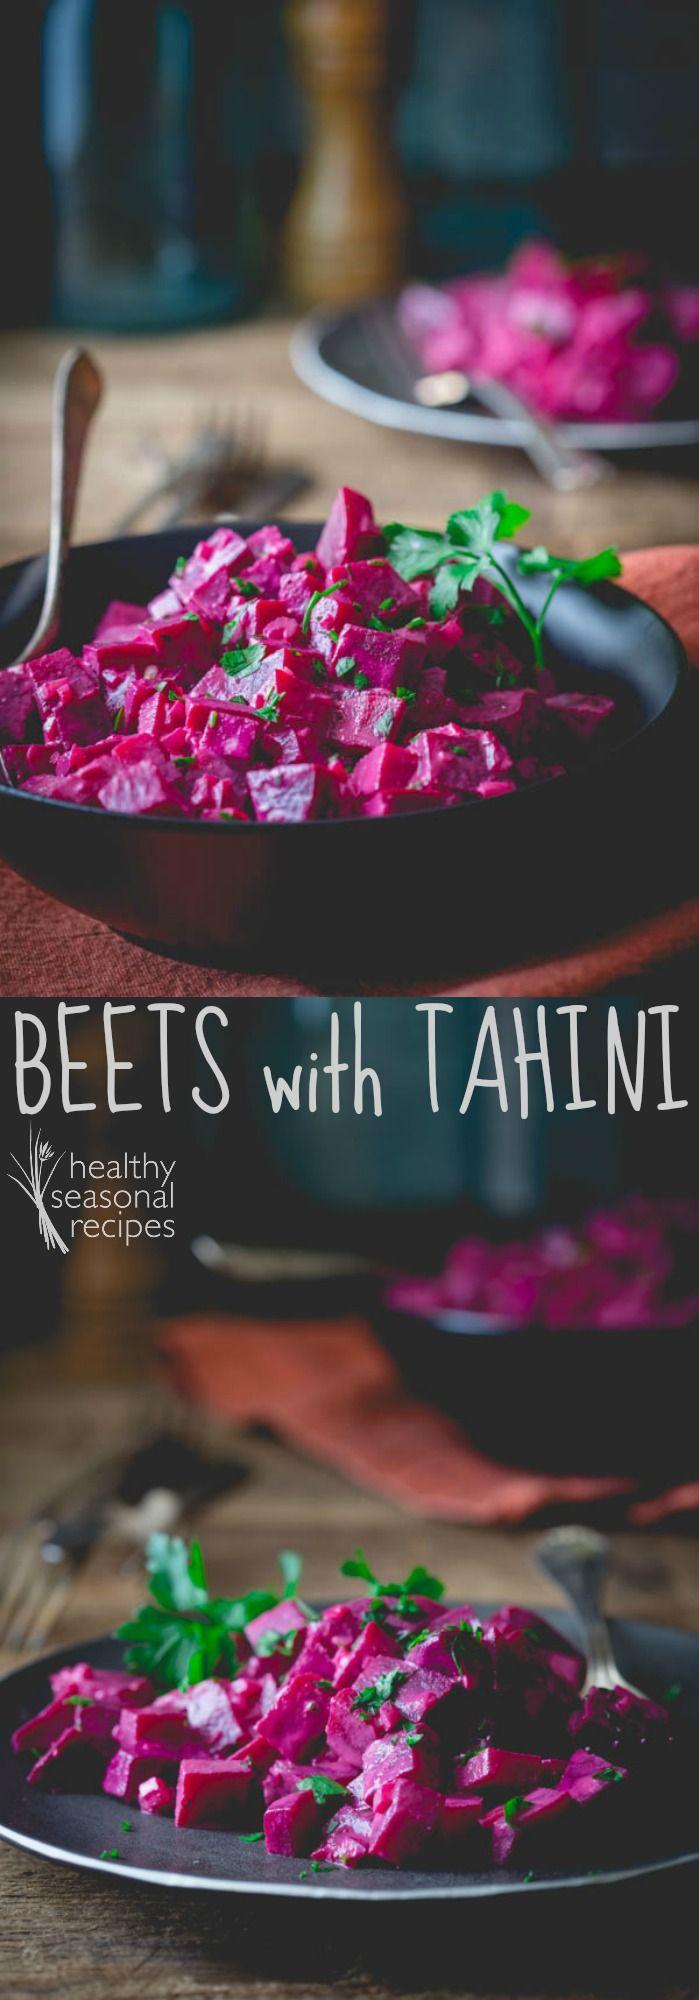 beets with tahini - Healthy Seasonal Recipes